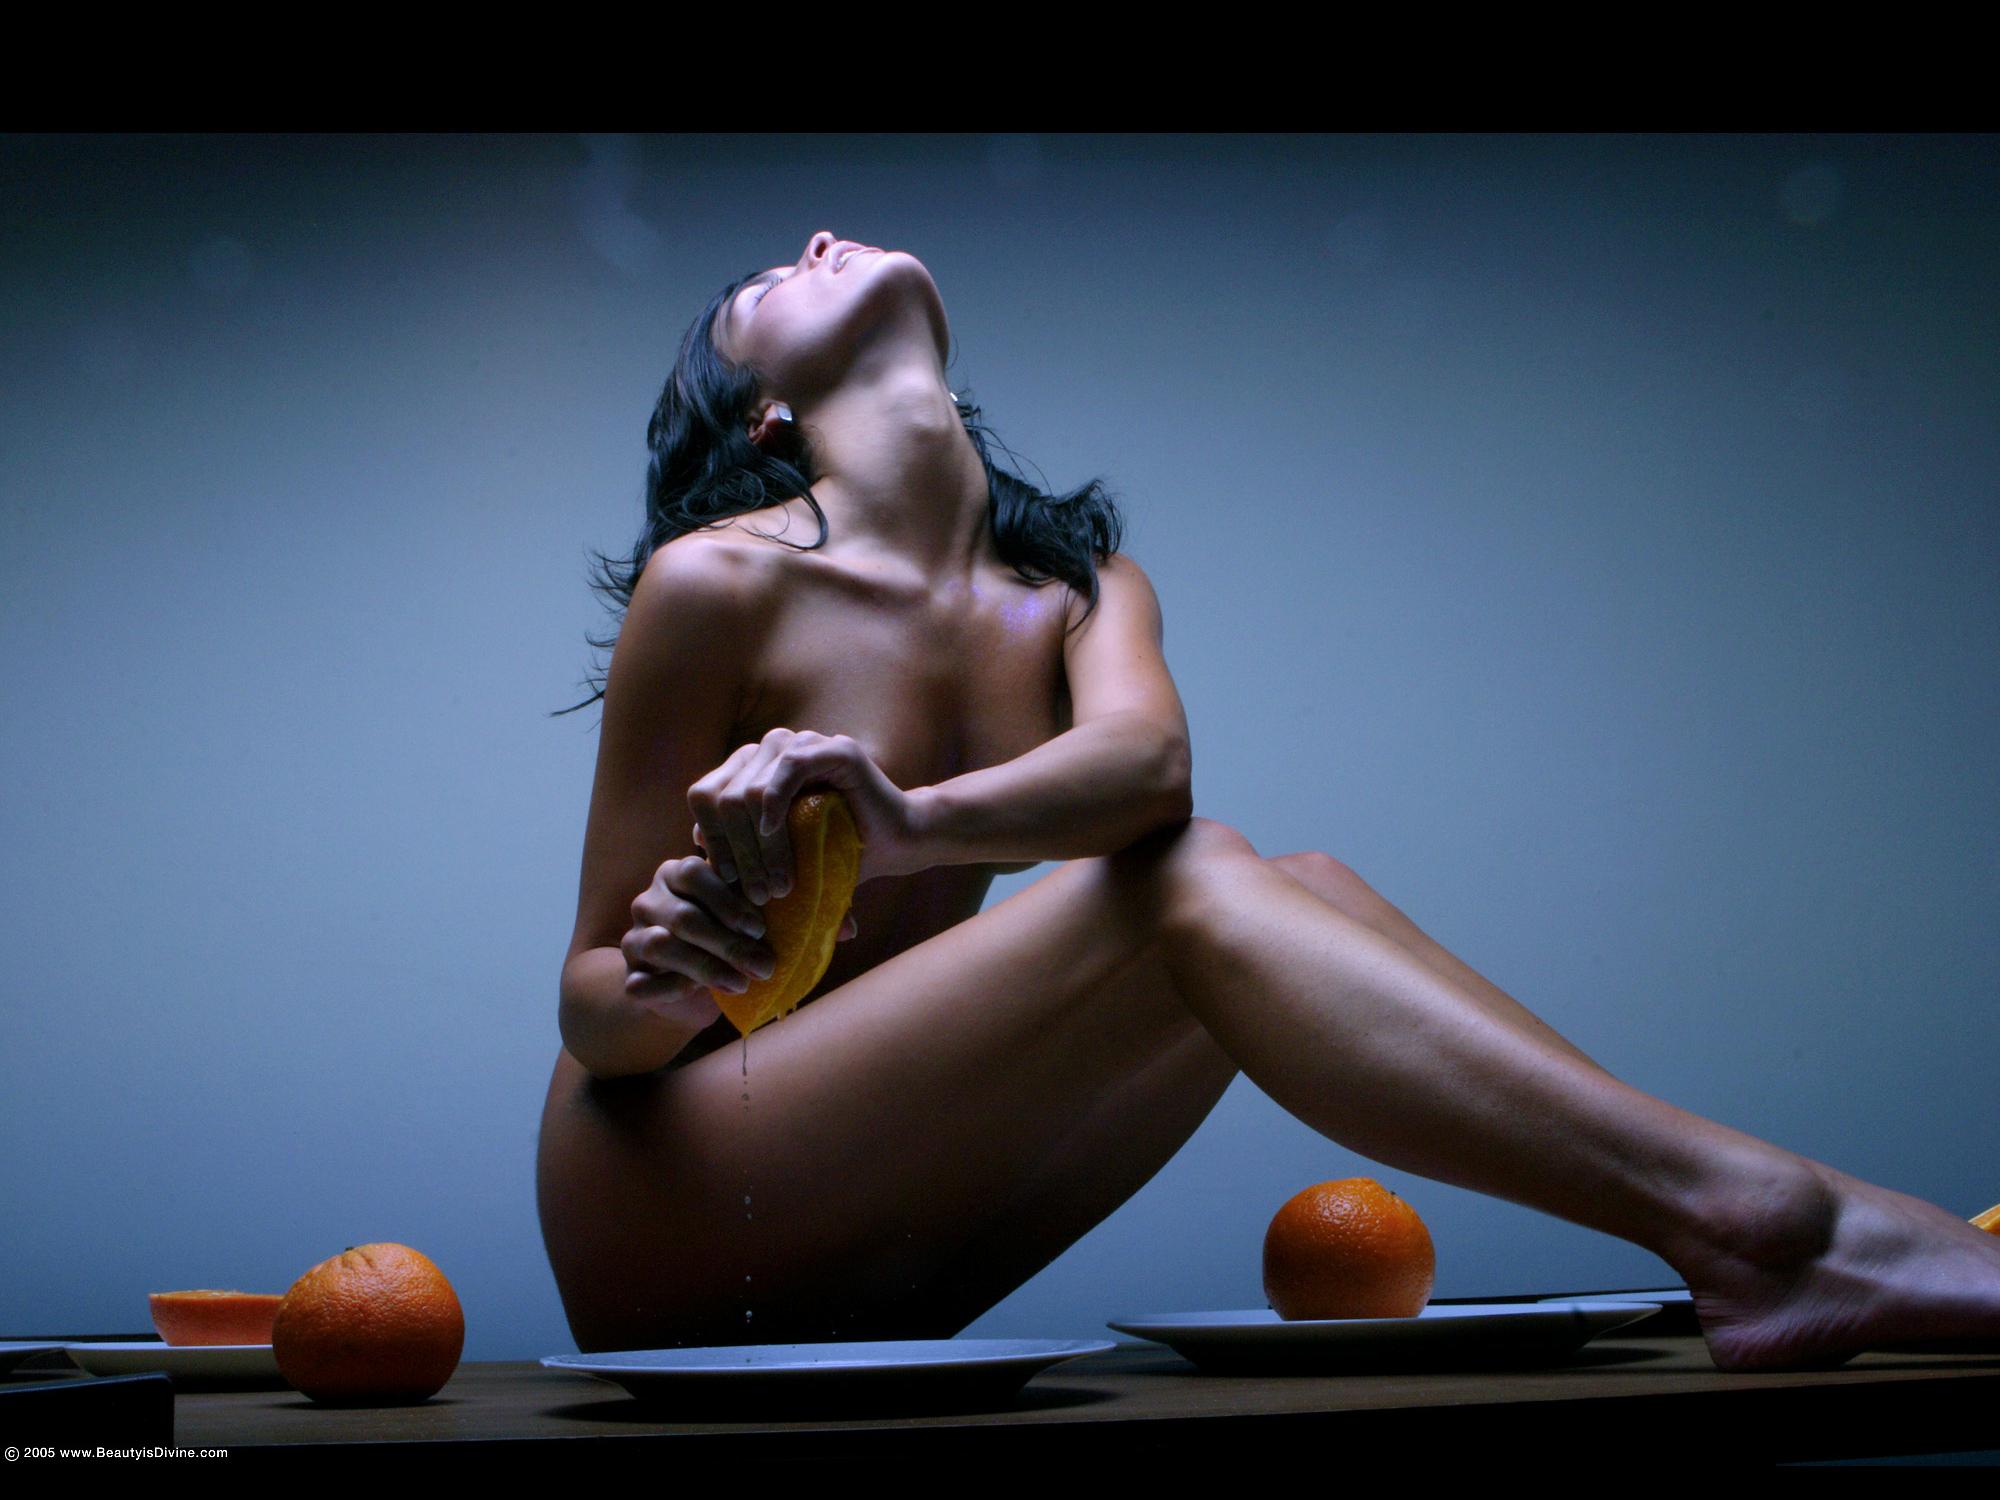 Обои, картинки поиск апельсин, Sexwall.ru - секс фотки, картинки с